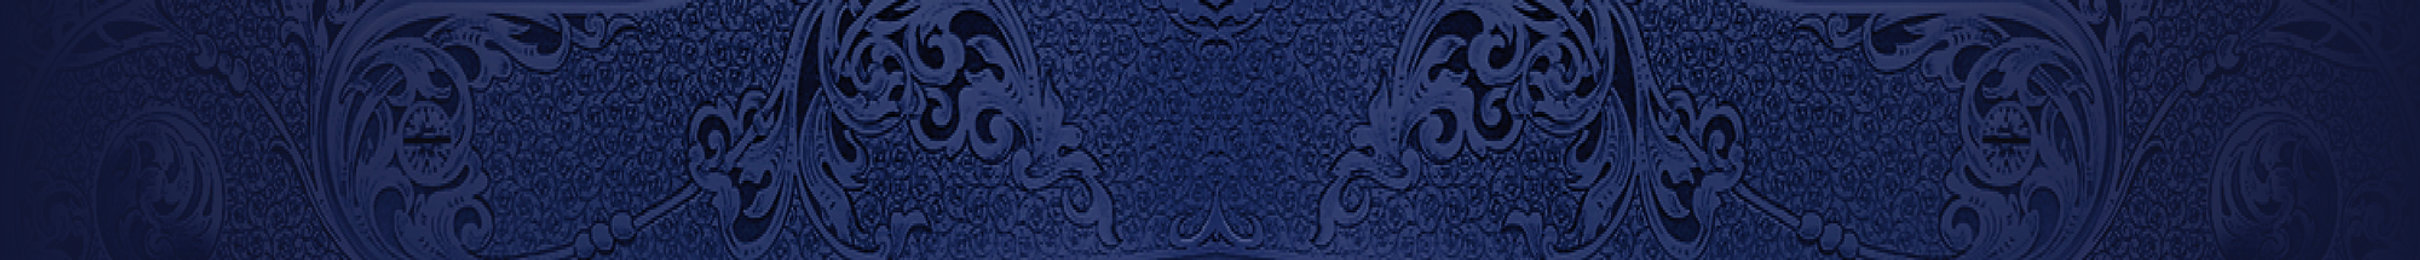 banner neu.jpg